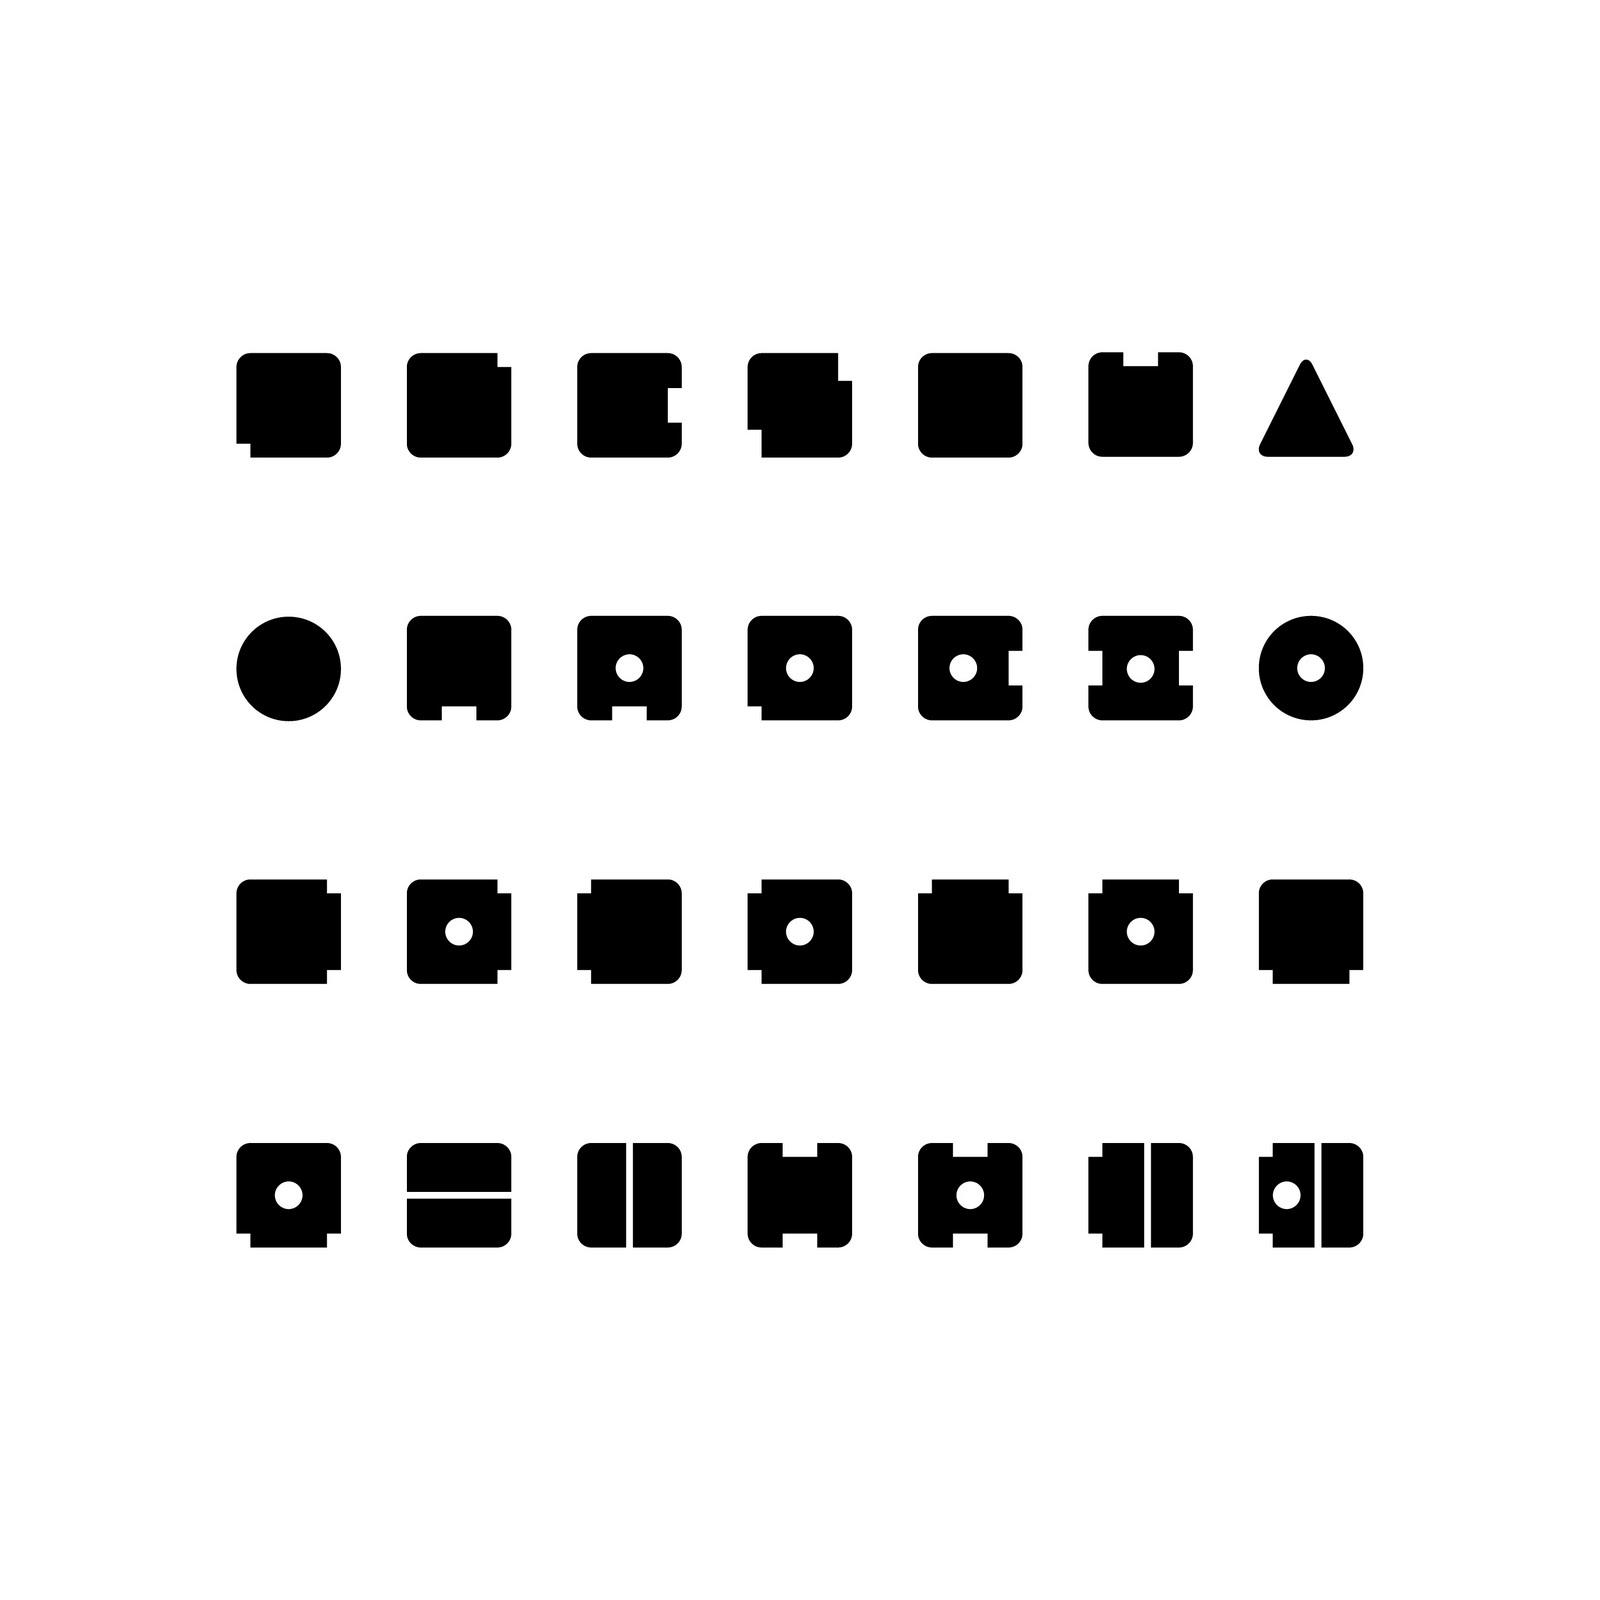 mosoom typography korean language hangul design basic 한글디자인 한글타이포 기본